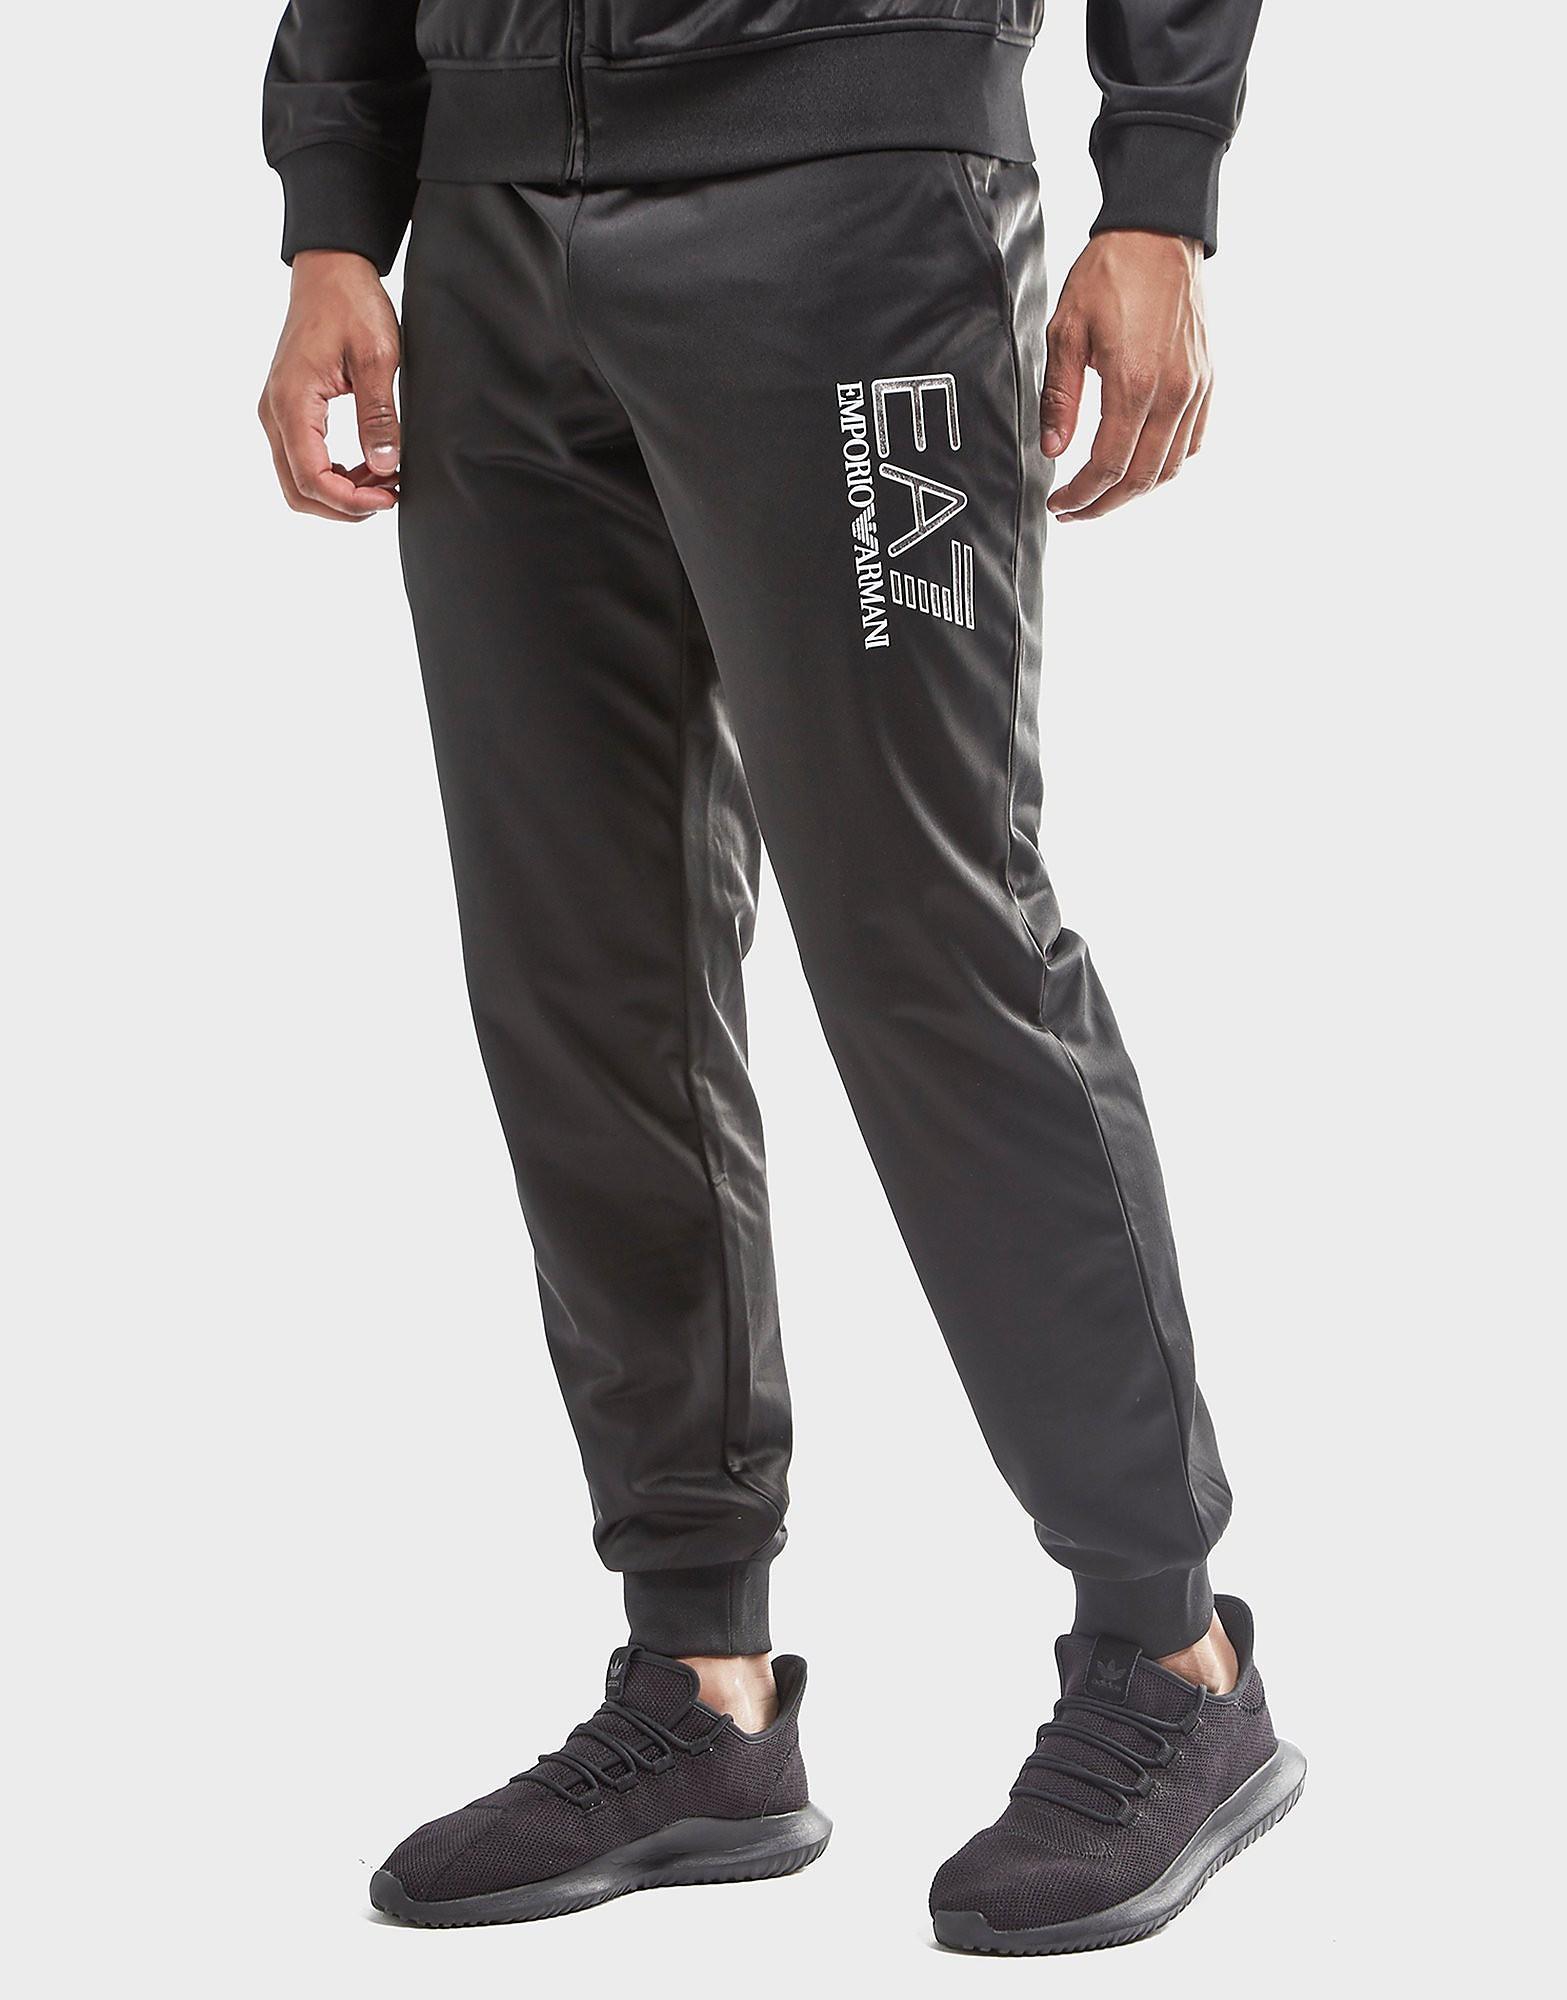 Emporio Armani EA7 Visbility Cuffed Track Pants